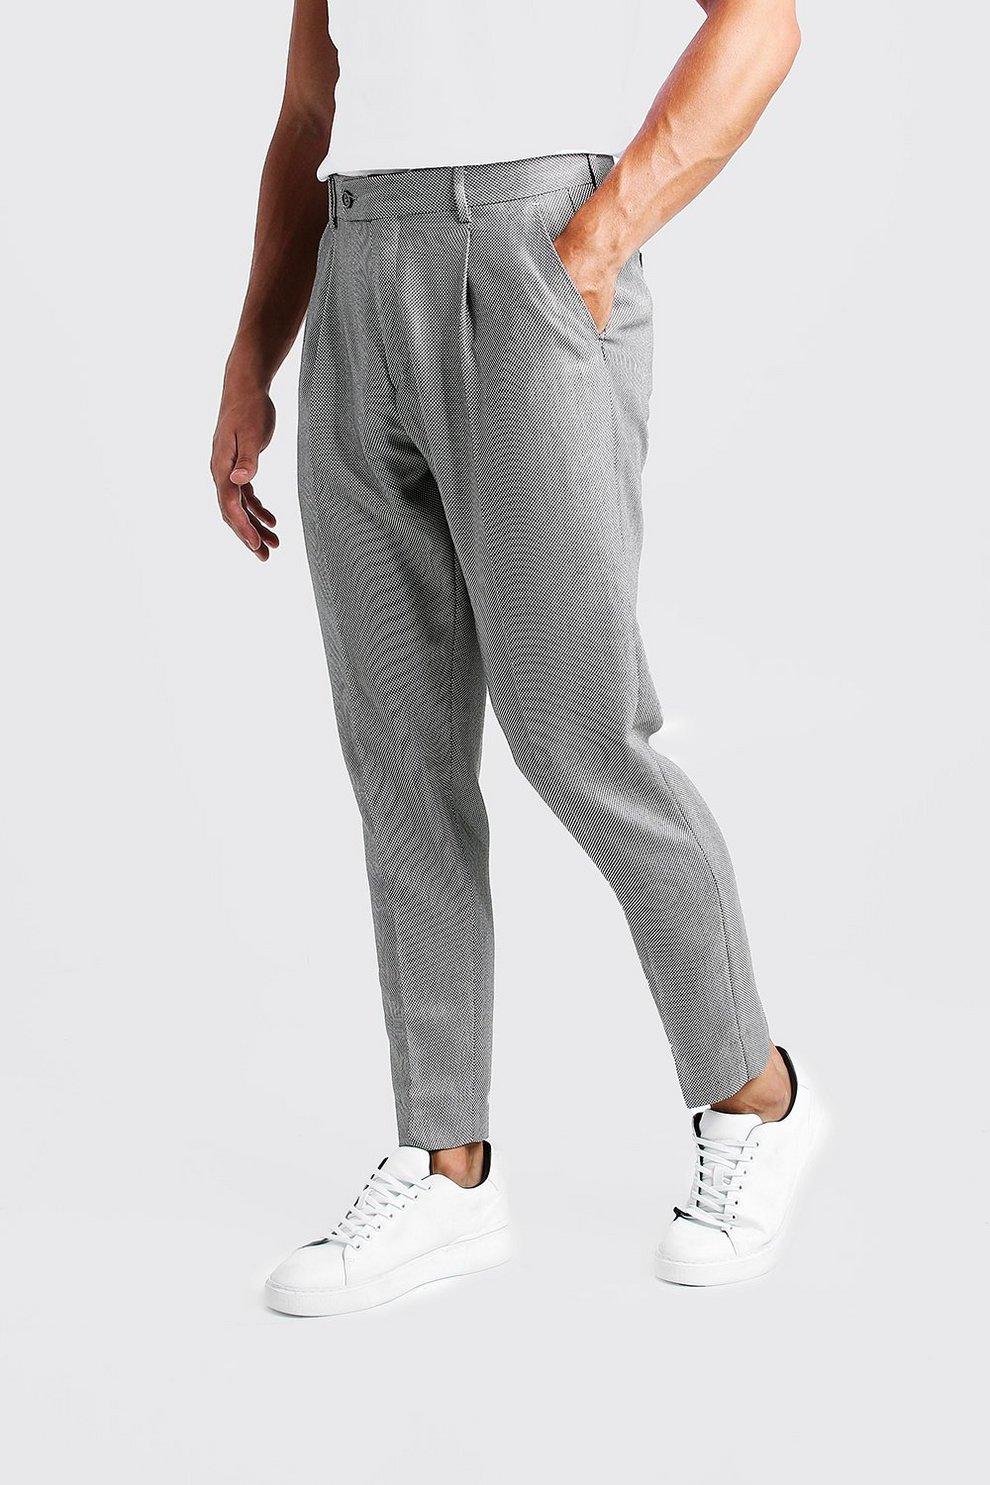 Textured Pleat Front Smart Trouser | Boohoo